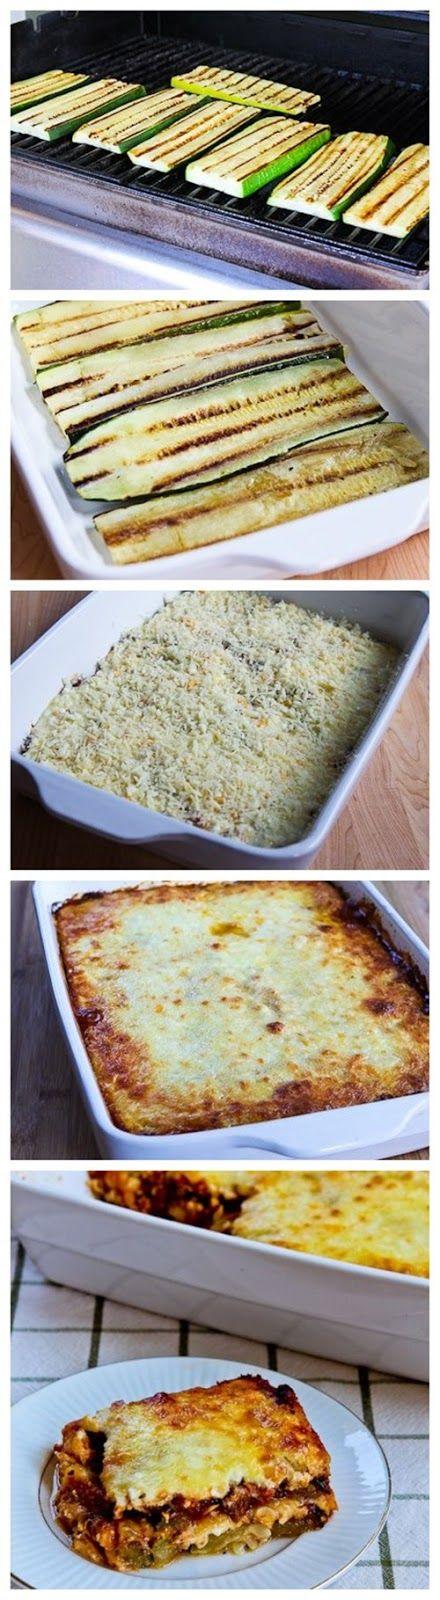 "Grilled Zucchini ""Lasagna"" With Italian Sausage, Tomato ..."